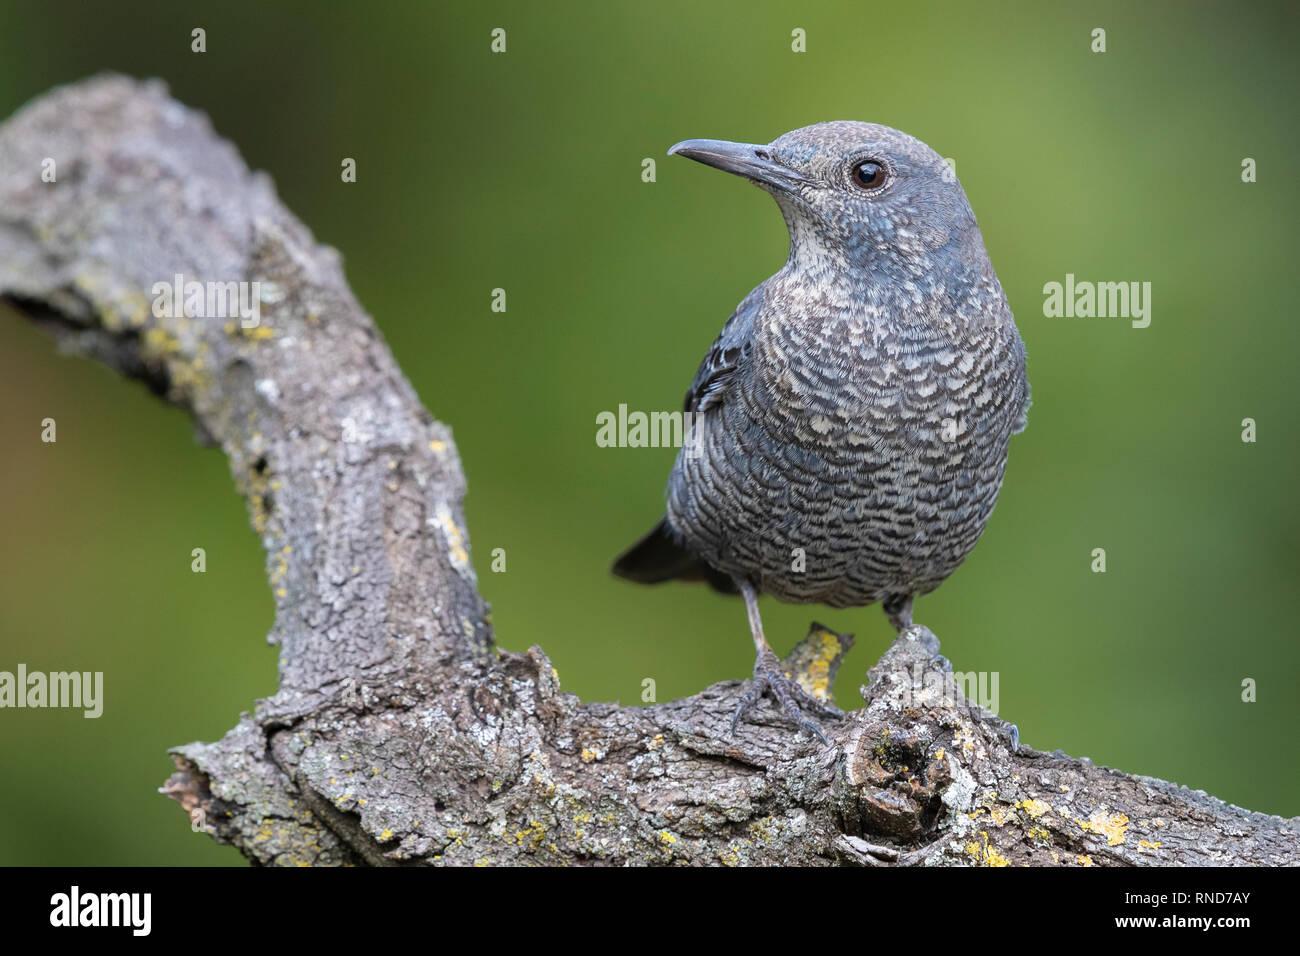 Blue Rock Thrush (Monticola solitarius), immature male perched on branch - Stock Image